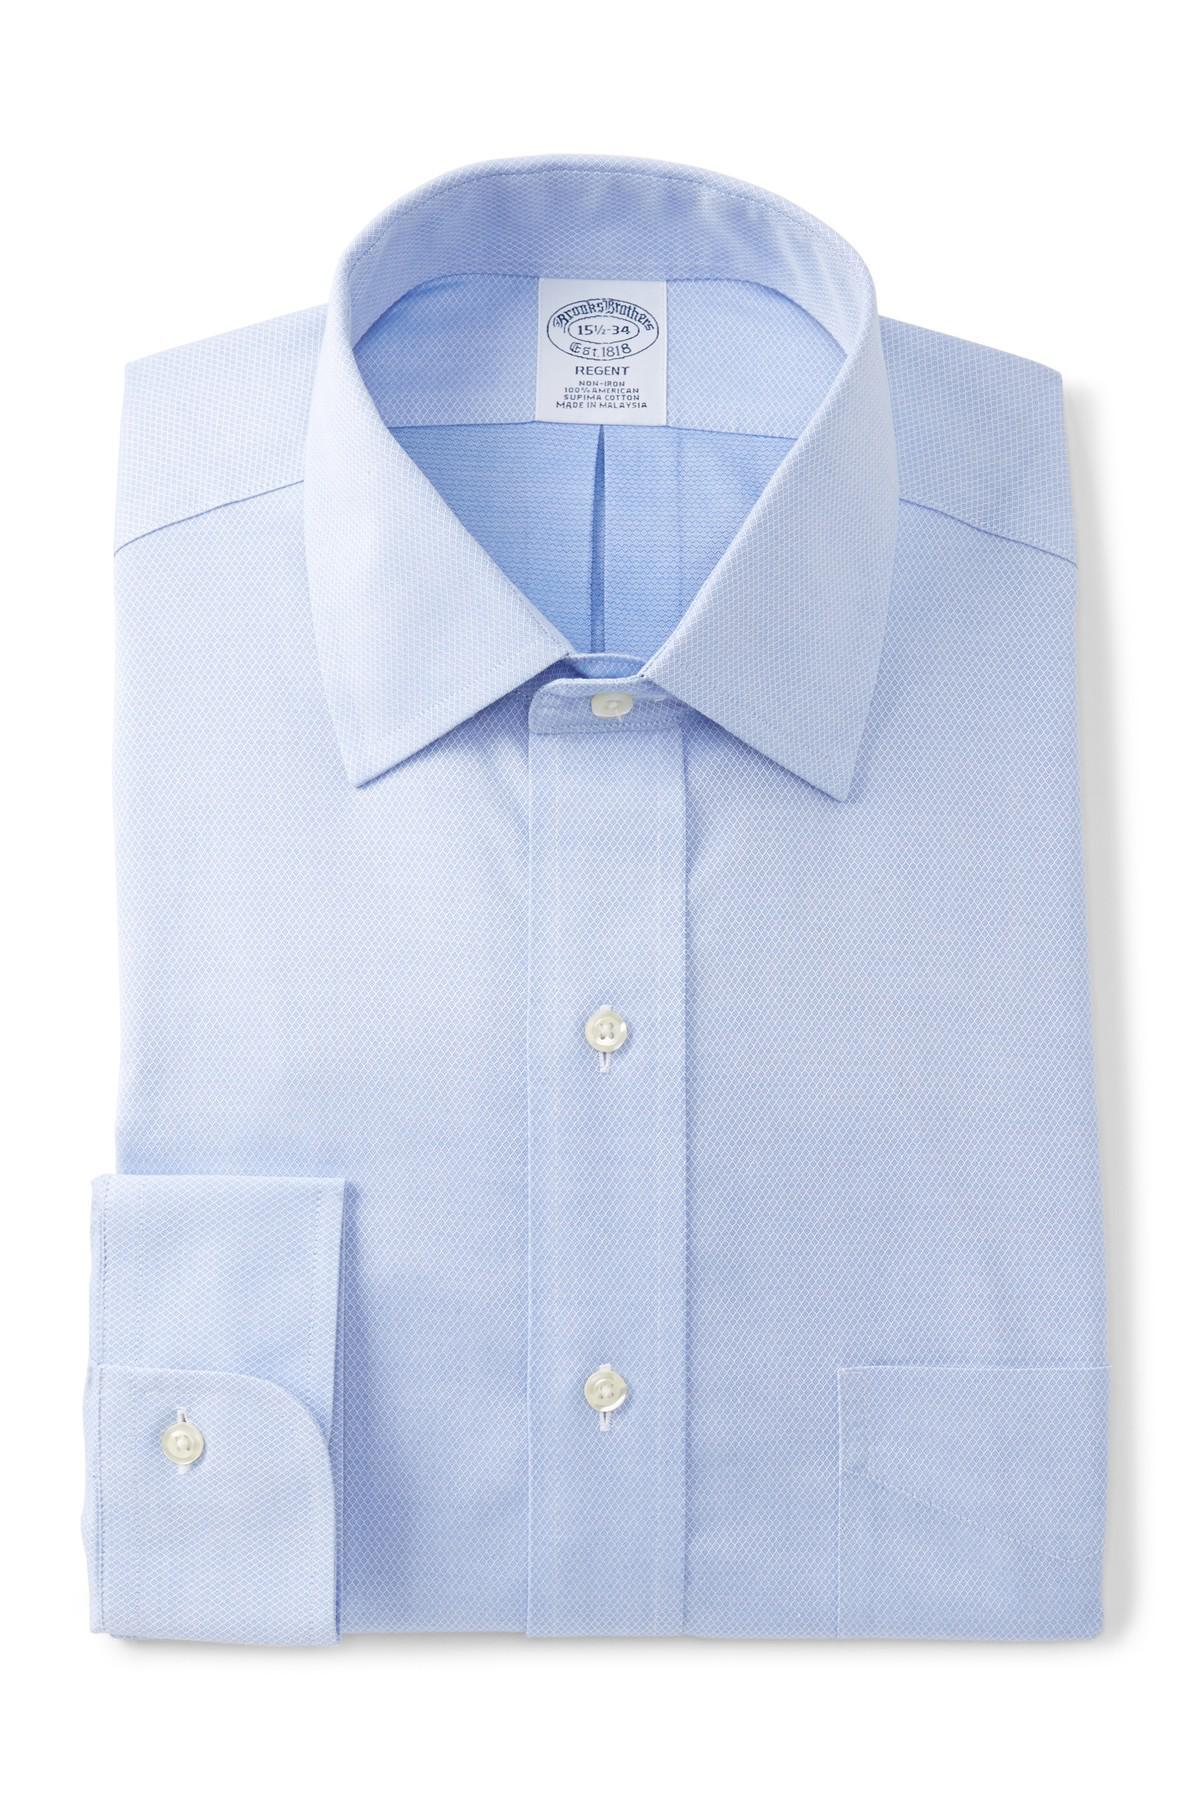 Lyst brooks brothers regent slim fit printed dress shirt for Brooks brothers dress shirt fit